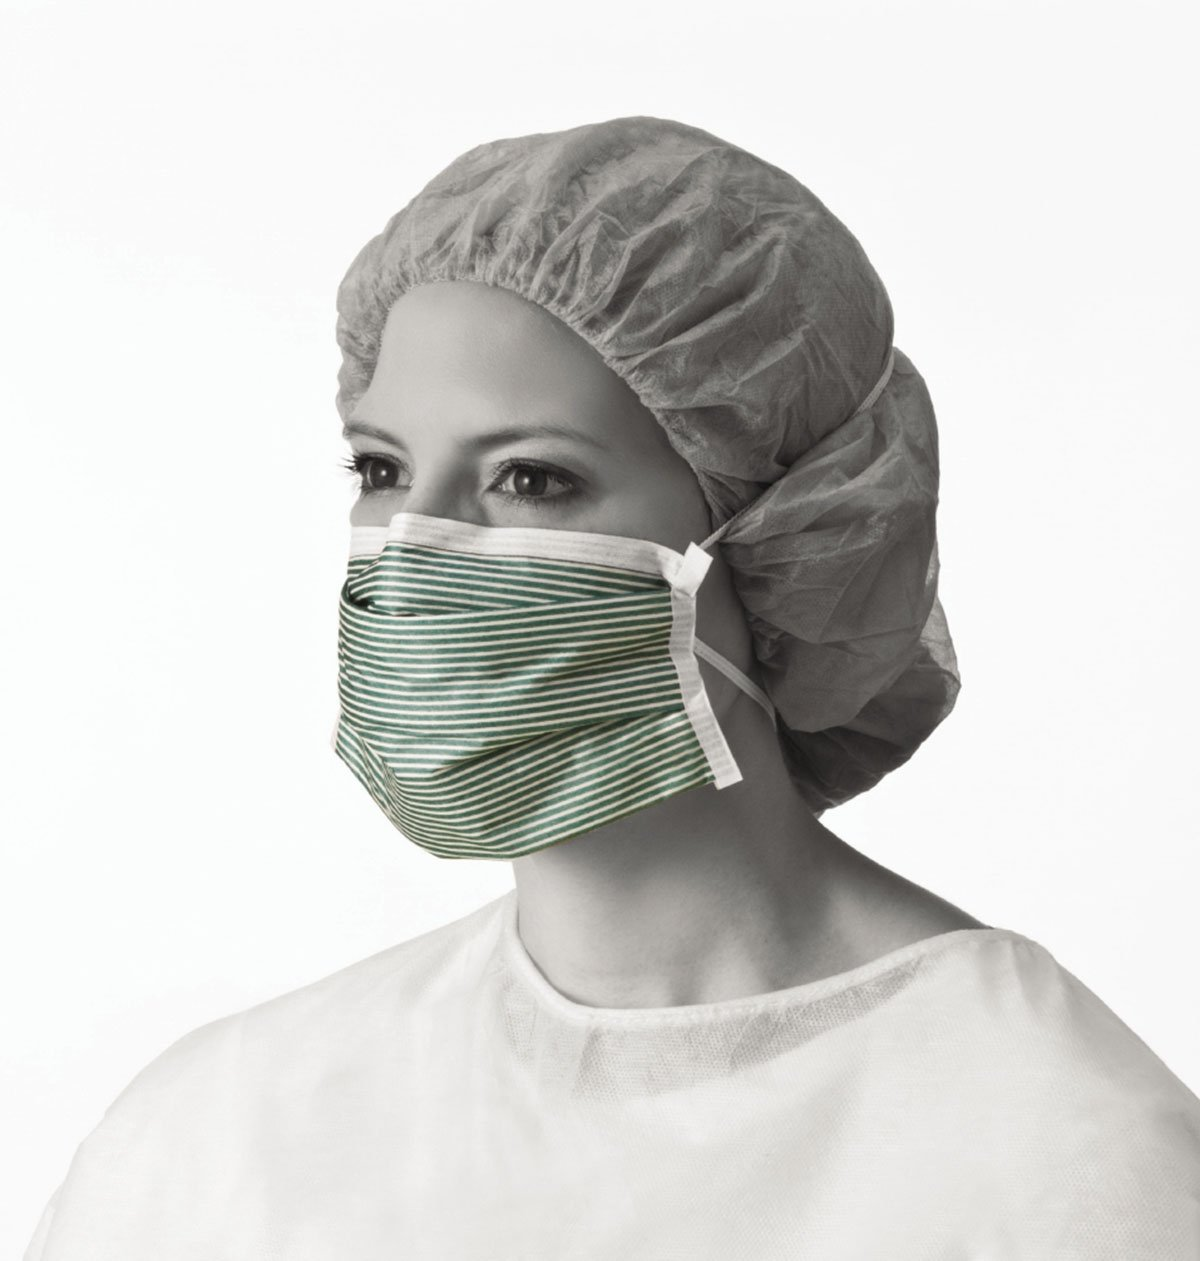 Medline NON27501 N95 Flat Fold Respirator Masks, Cellulose, Latex Free, White/Green (Pack of 210) by Medline (Image #1)